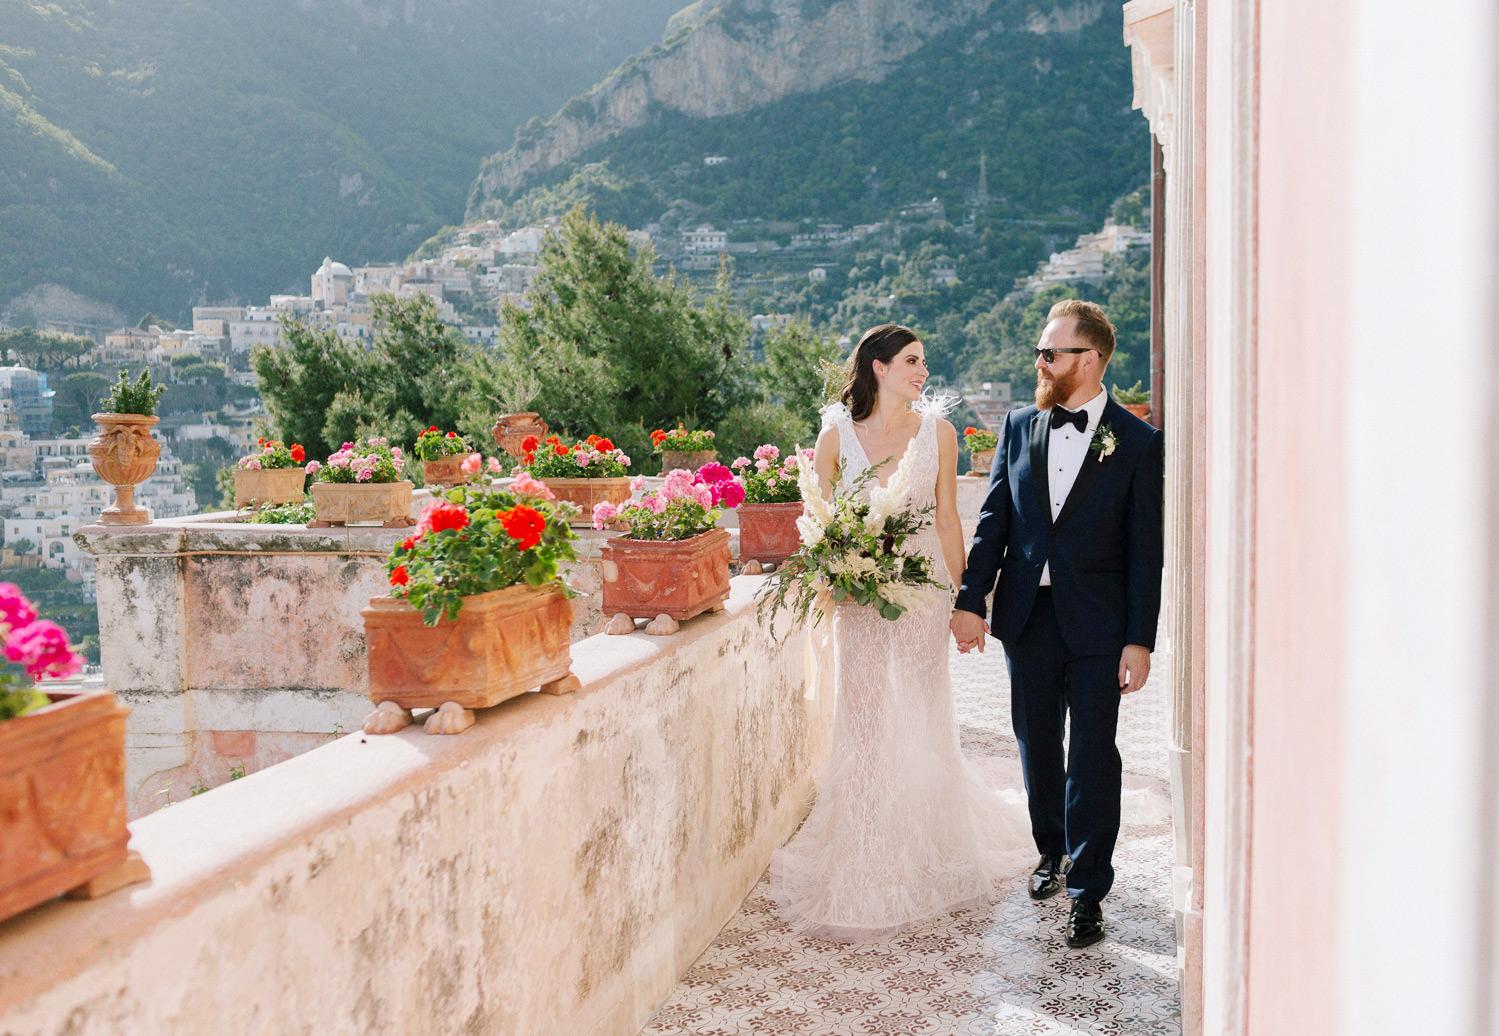 Stylish bride and groom at Villa San Giacomo in Positano | Photo: Camilla Anchisi Photography | Planning: Weddings Italy